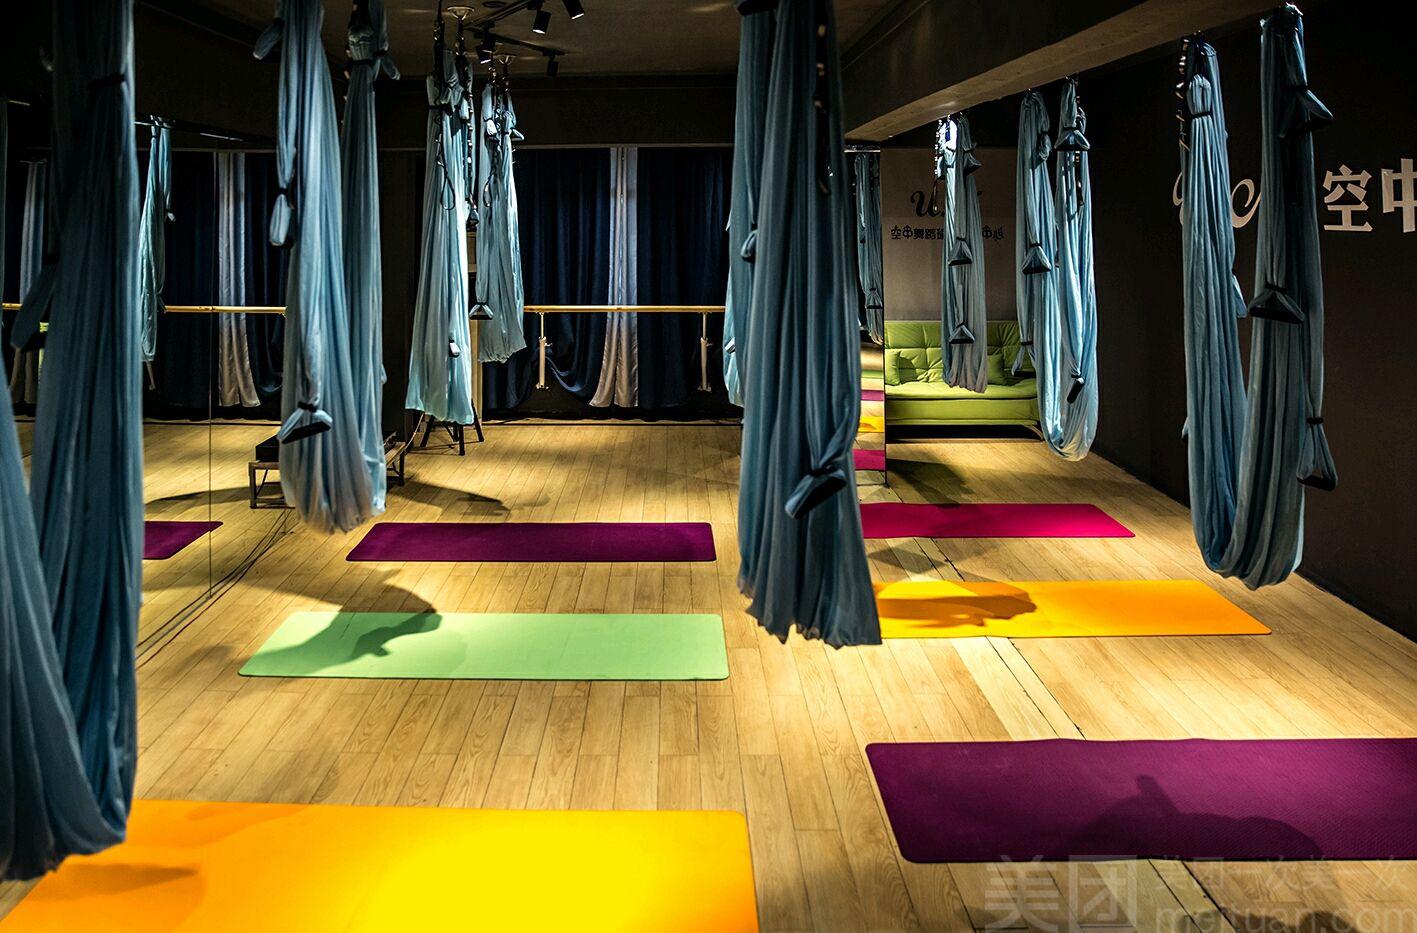 UN空中舞蹈瑜伽培训中心-美团